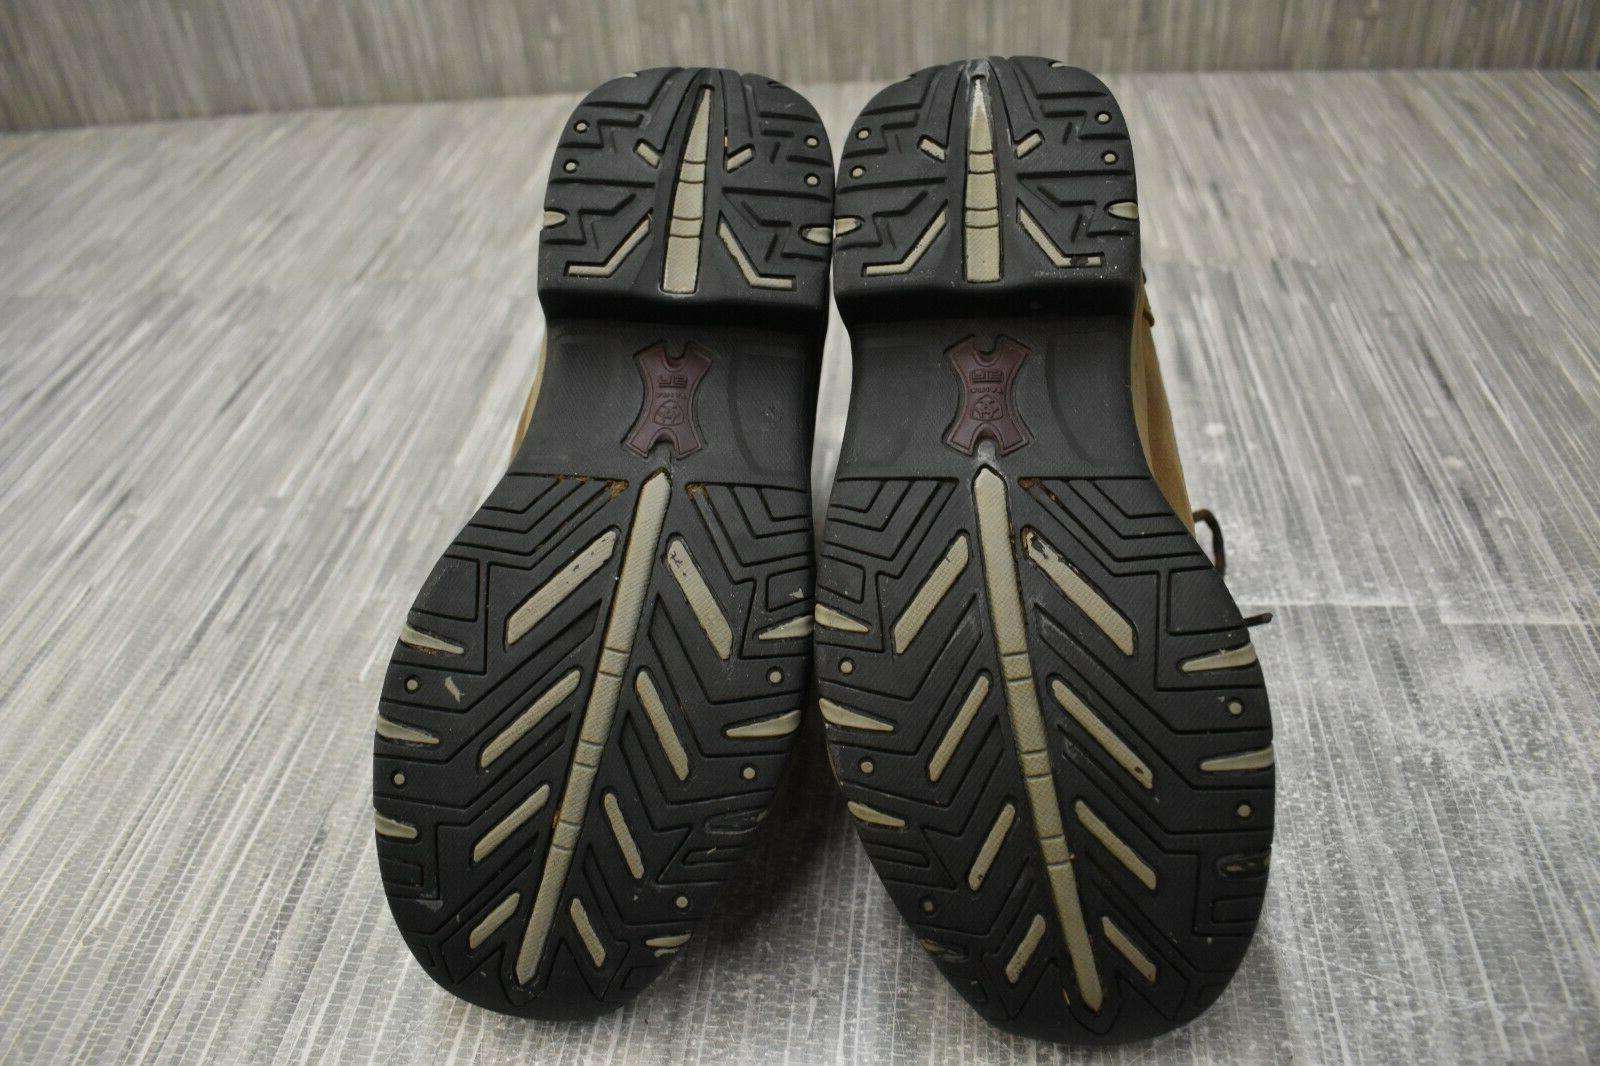 Ariat Terrain Hiking Boots, B,